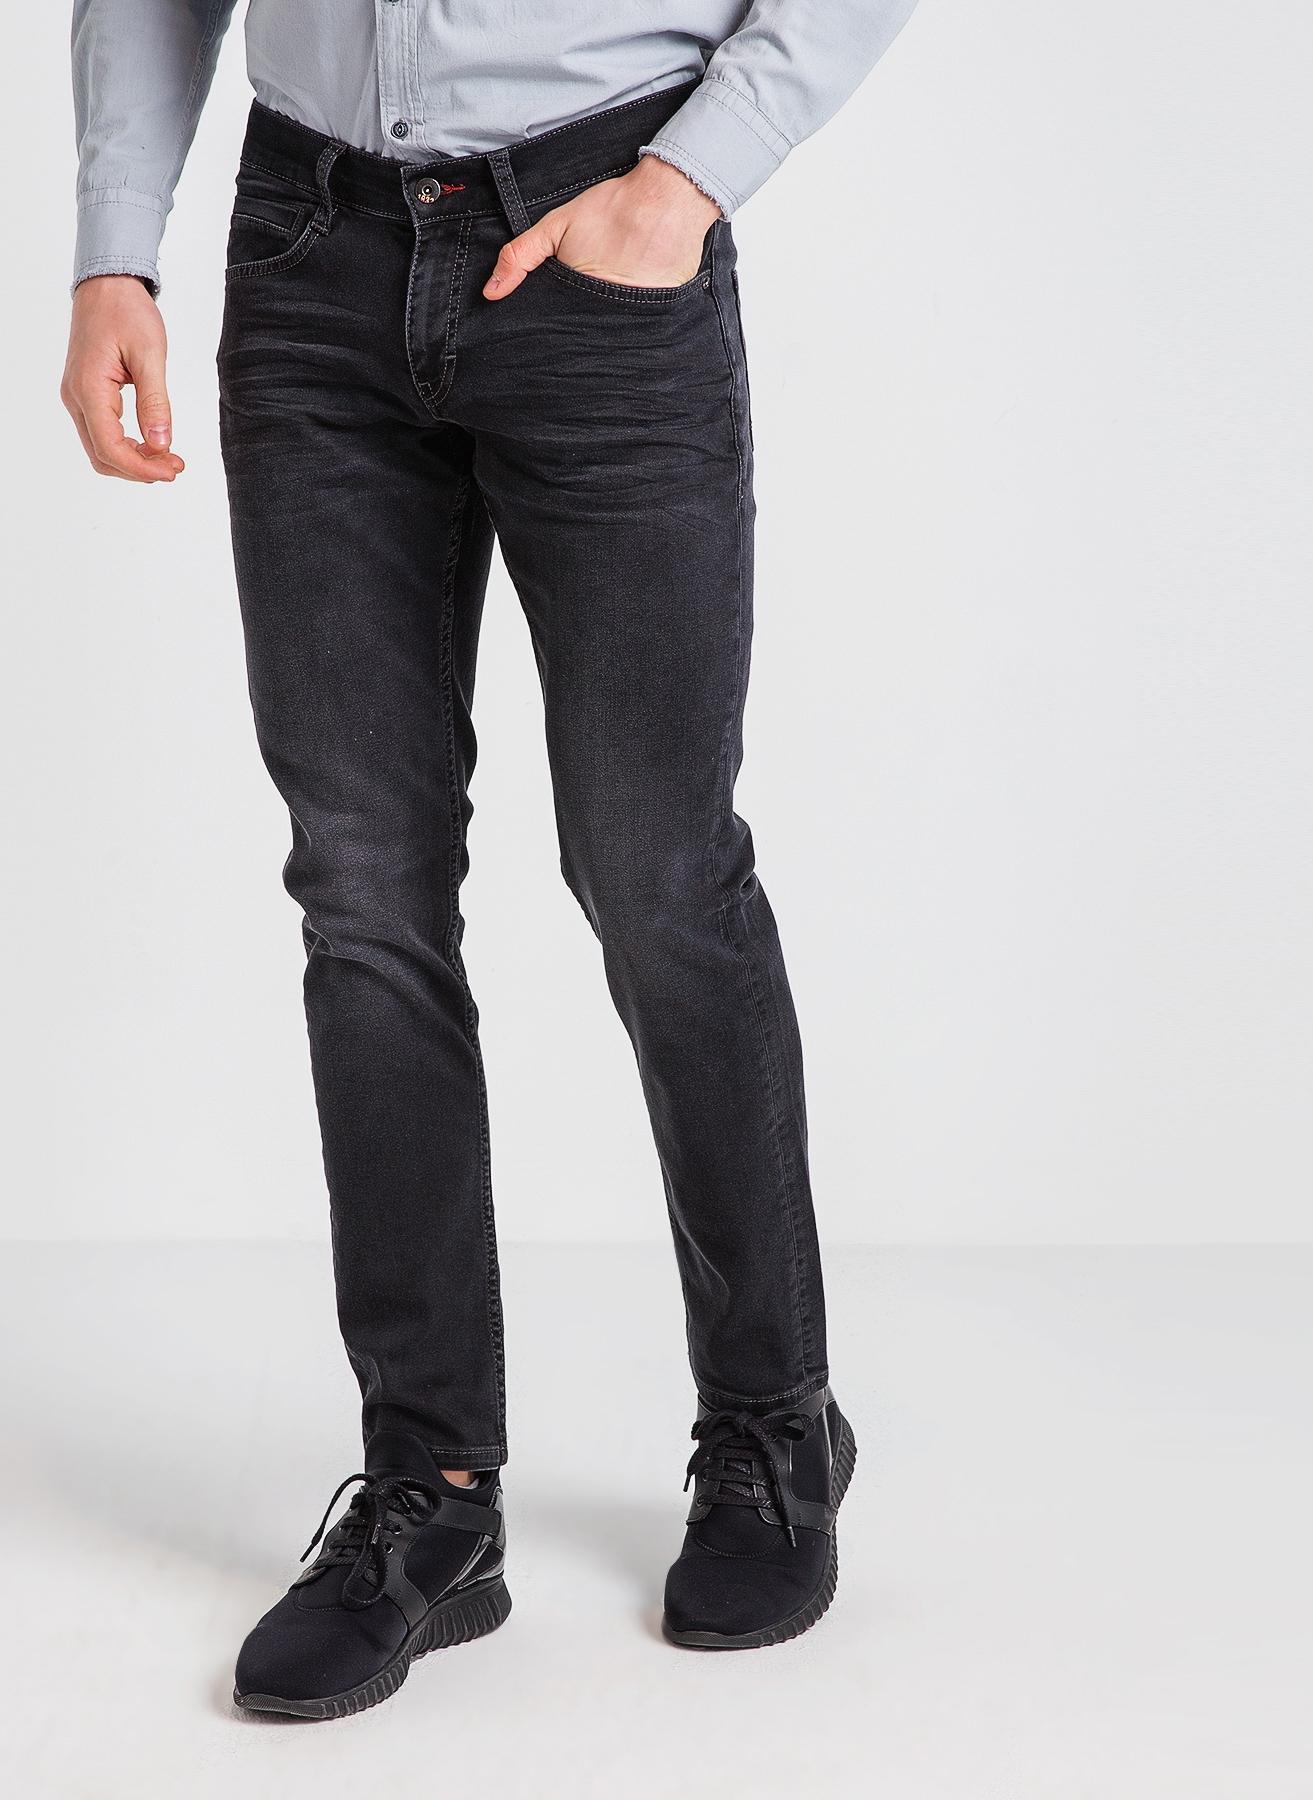 Mustang Slim Rise Siyah Klasik Pantolon 31-30 5000200009003 Ürün Resmi